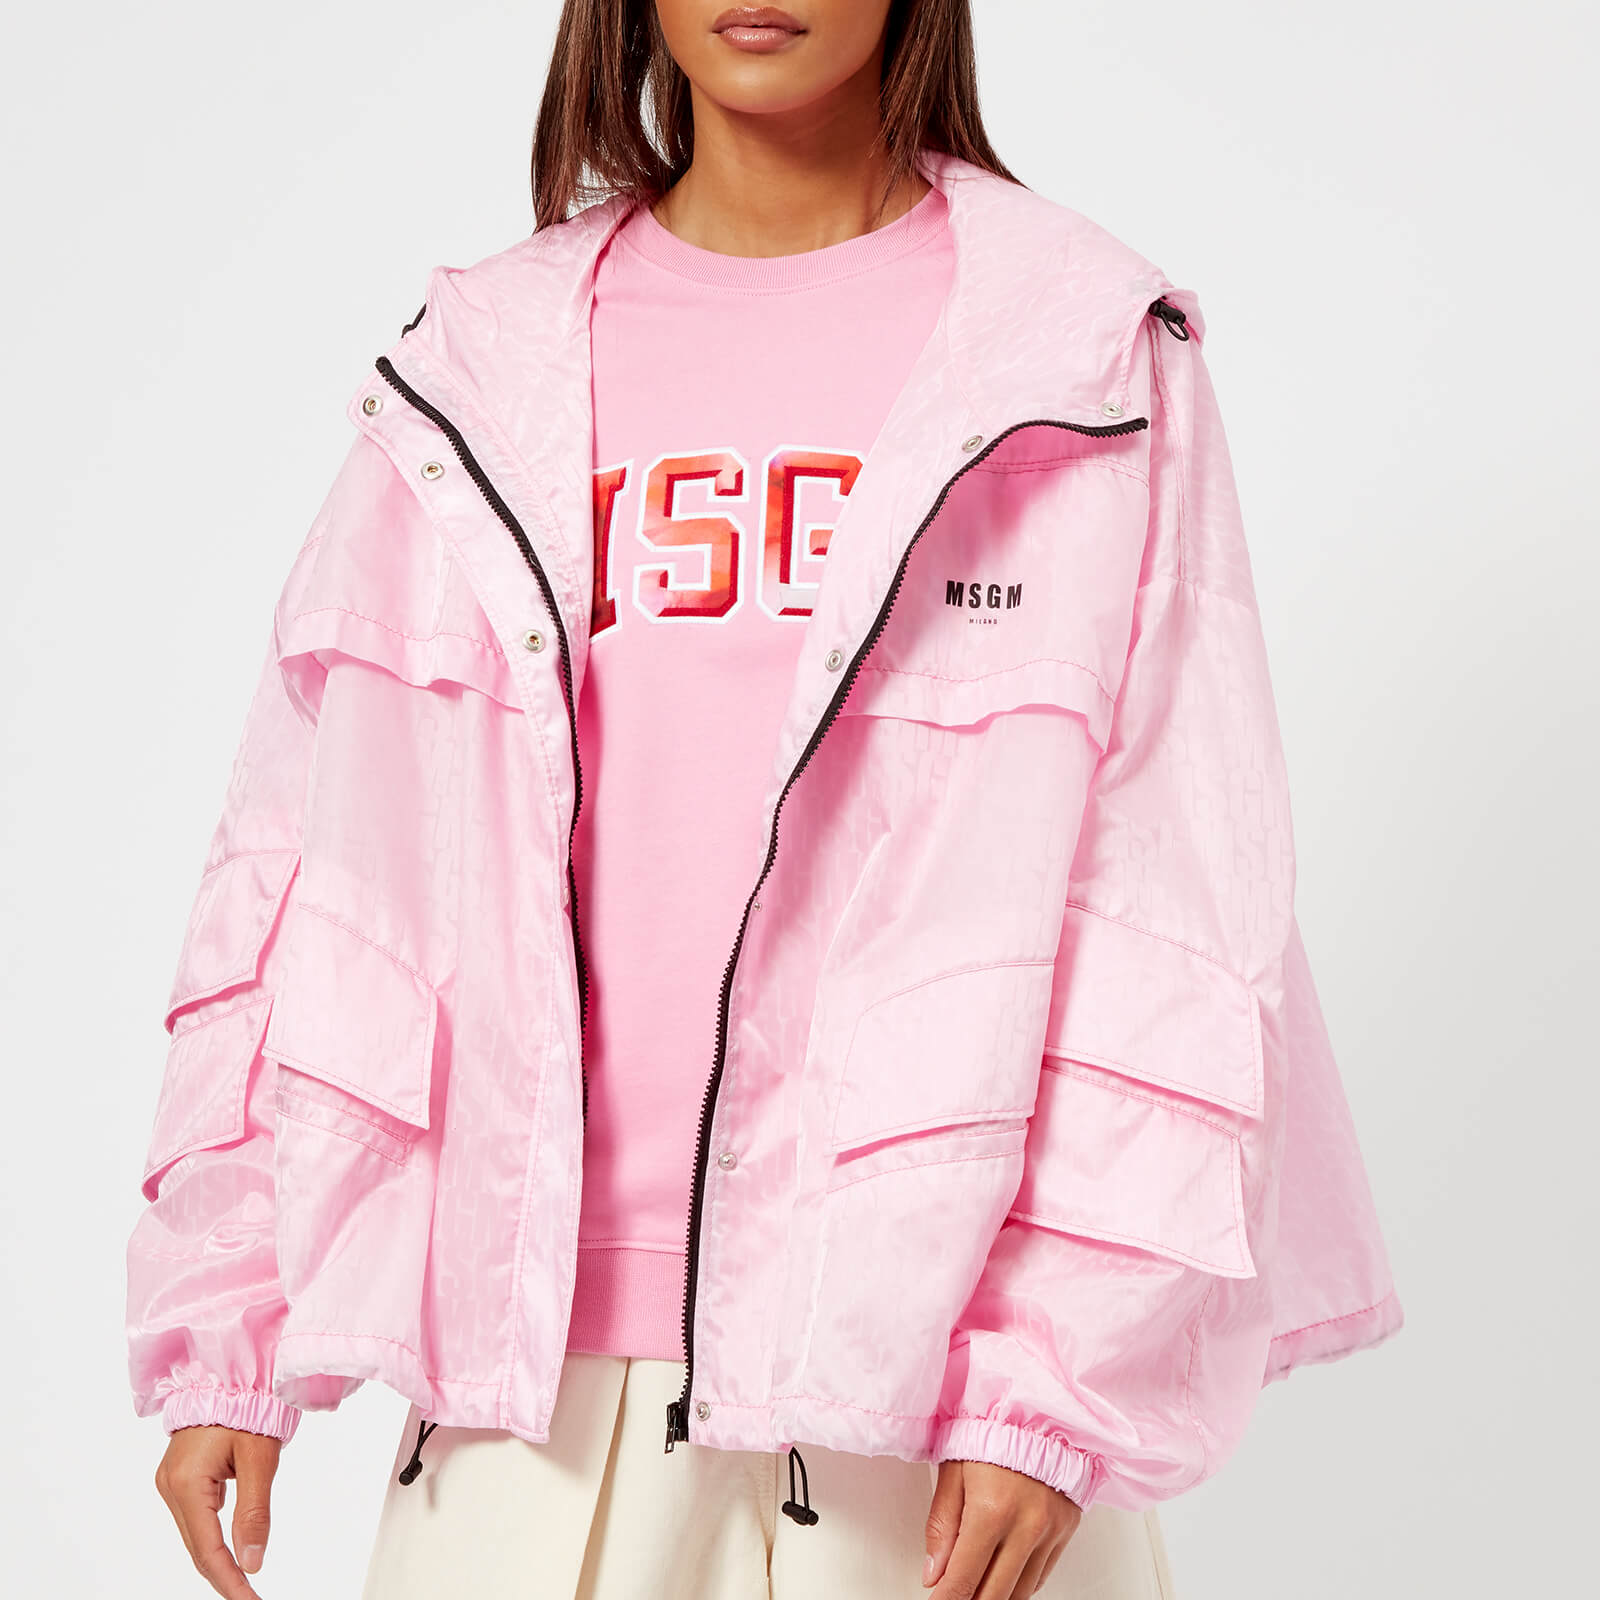 8034661da MSGM Women's Waterproof Coat with Hood - Pink